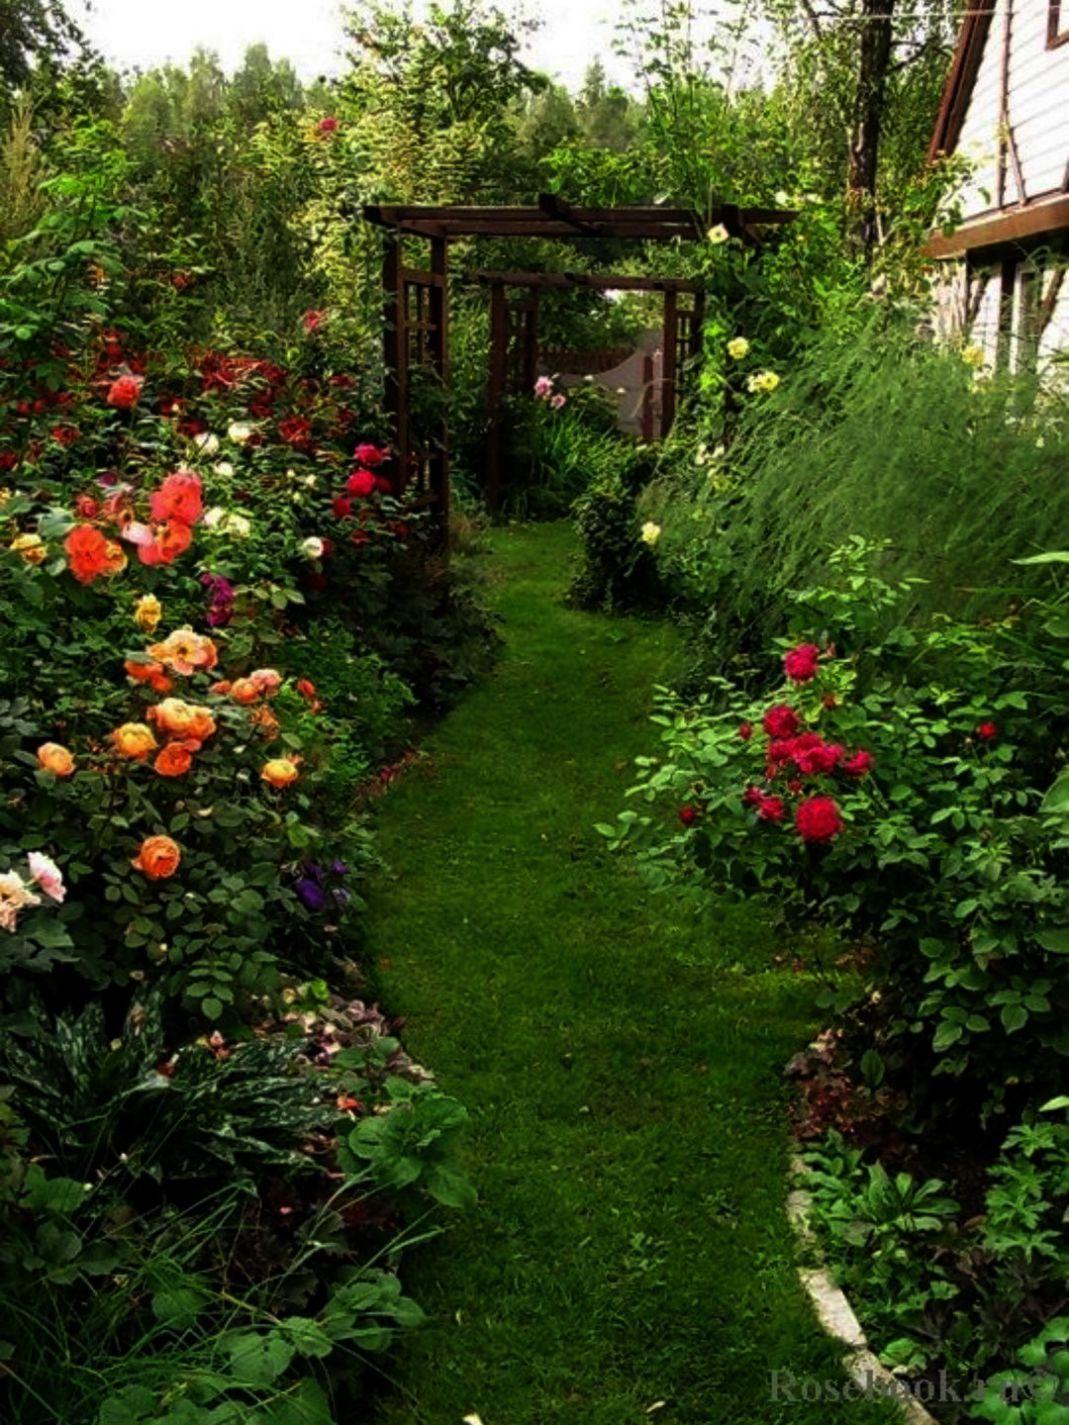 Landscape Gardening Magazine Uk Under Planting Ideas For Tall Outdoor Planters Backyard Landscape Landscape Design Backyard Landscaping Cottage Garden Design